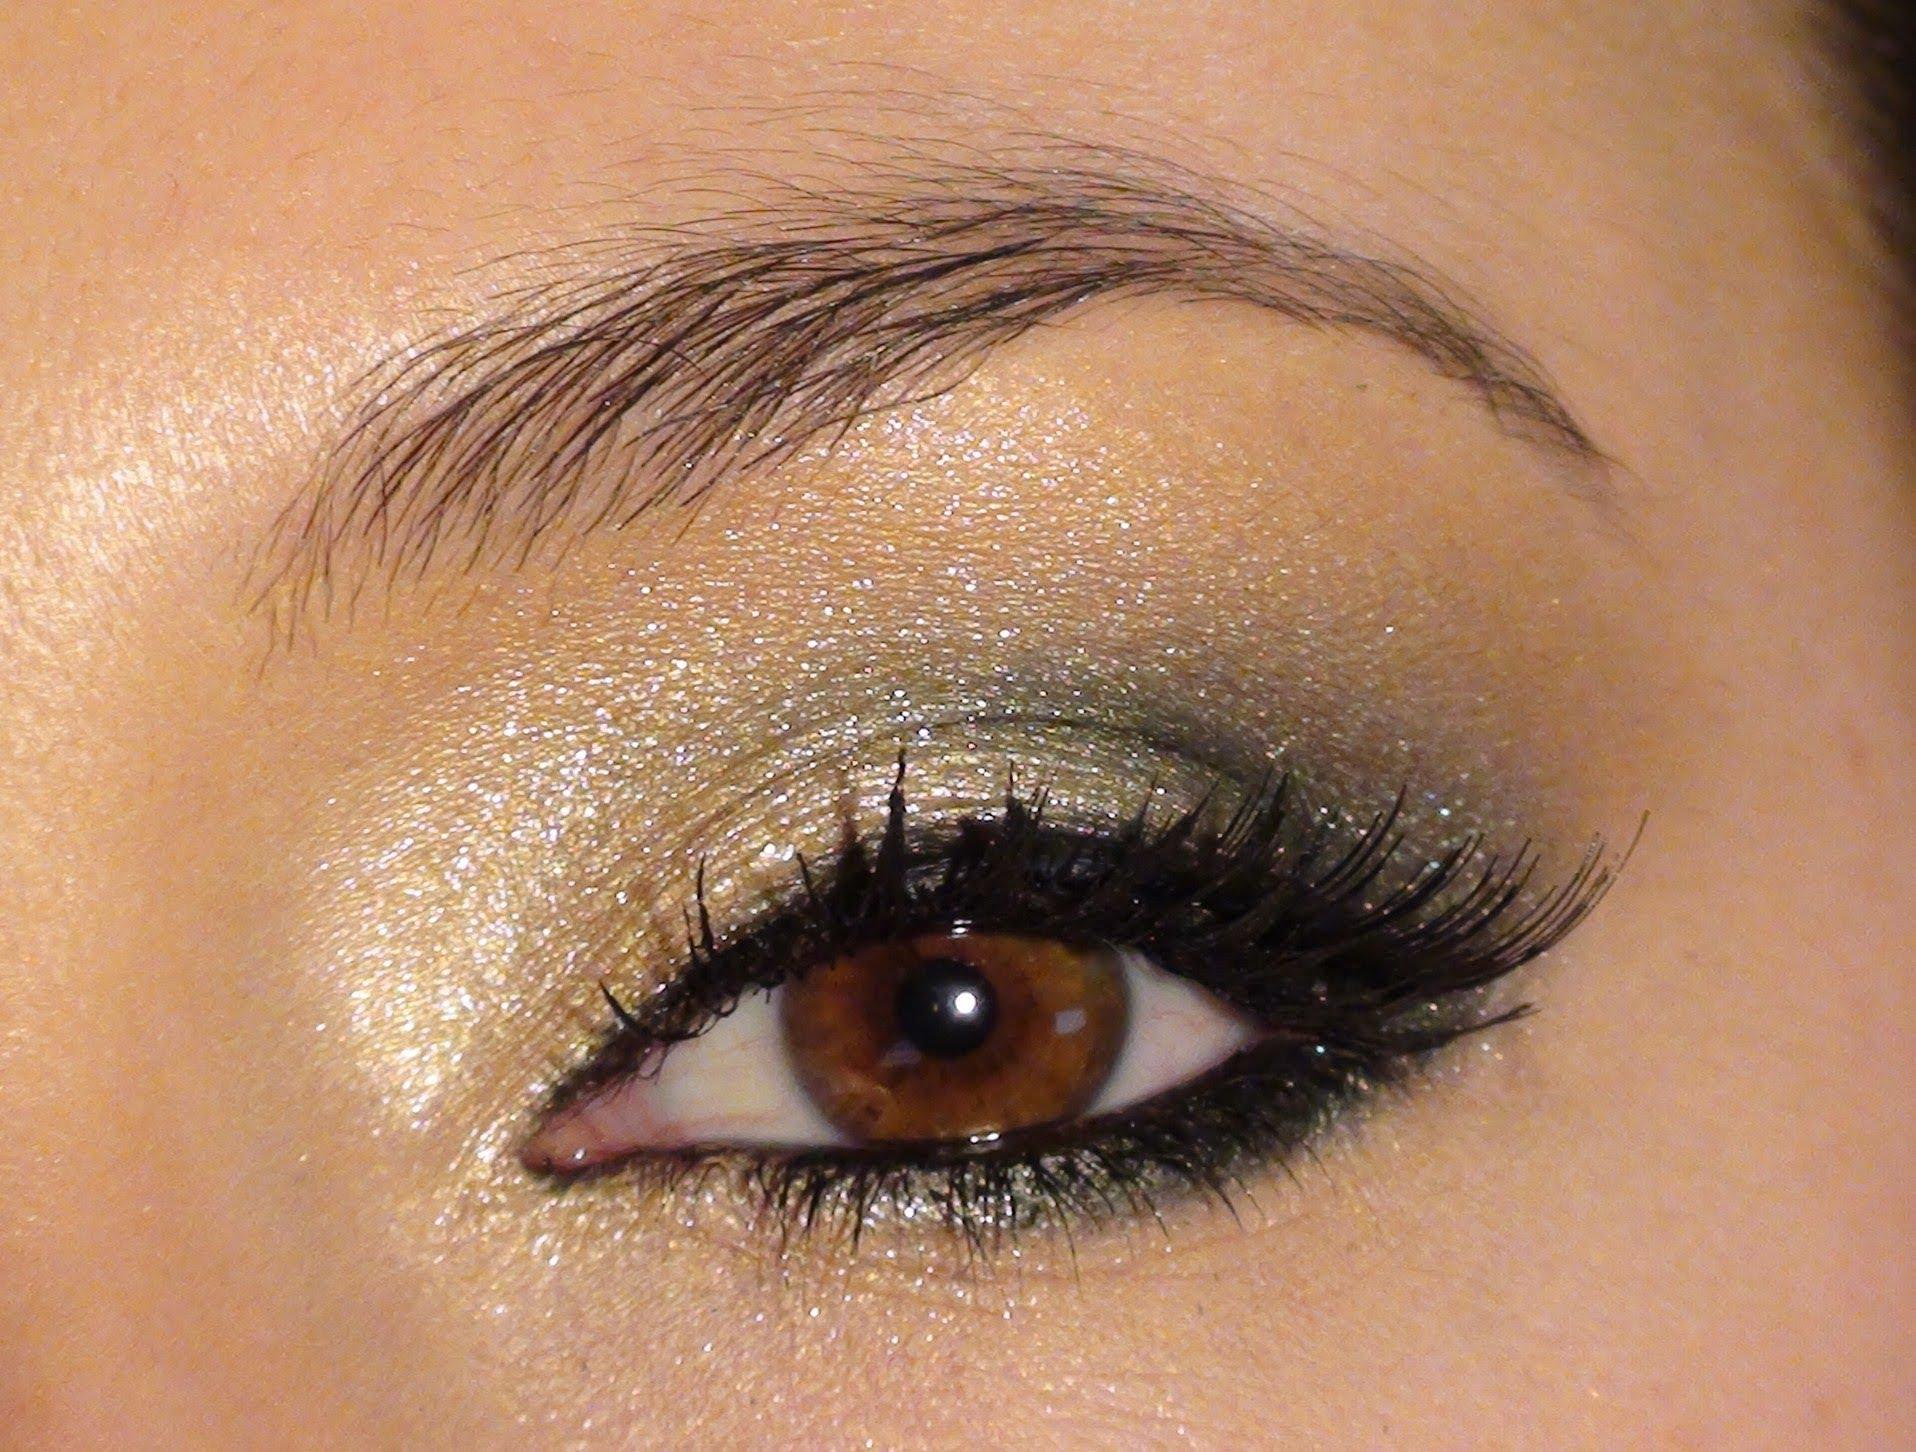 Le maquillage des yeux dor maquillage des yeux - Maquillage naturel yeux vert ...